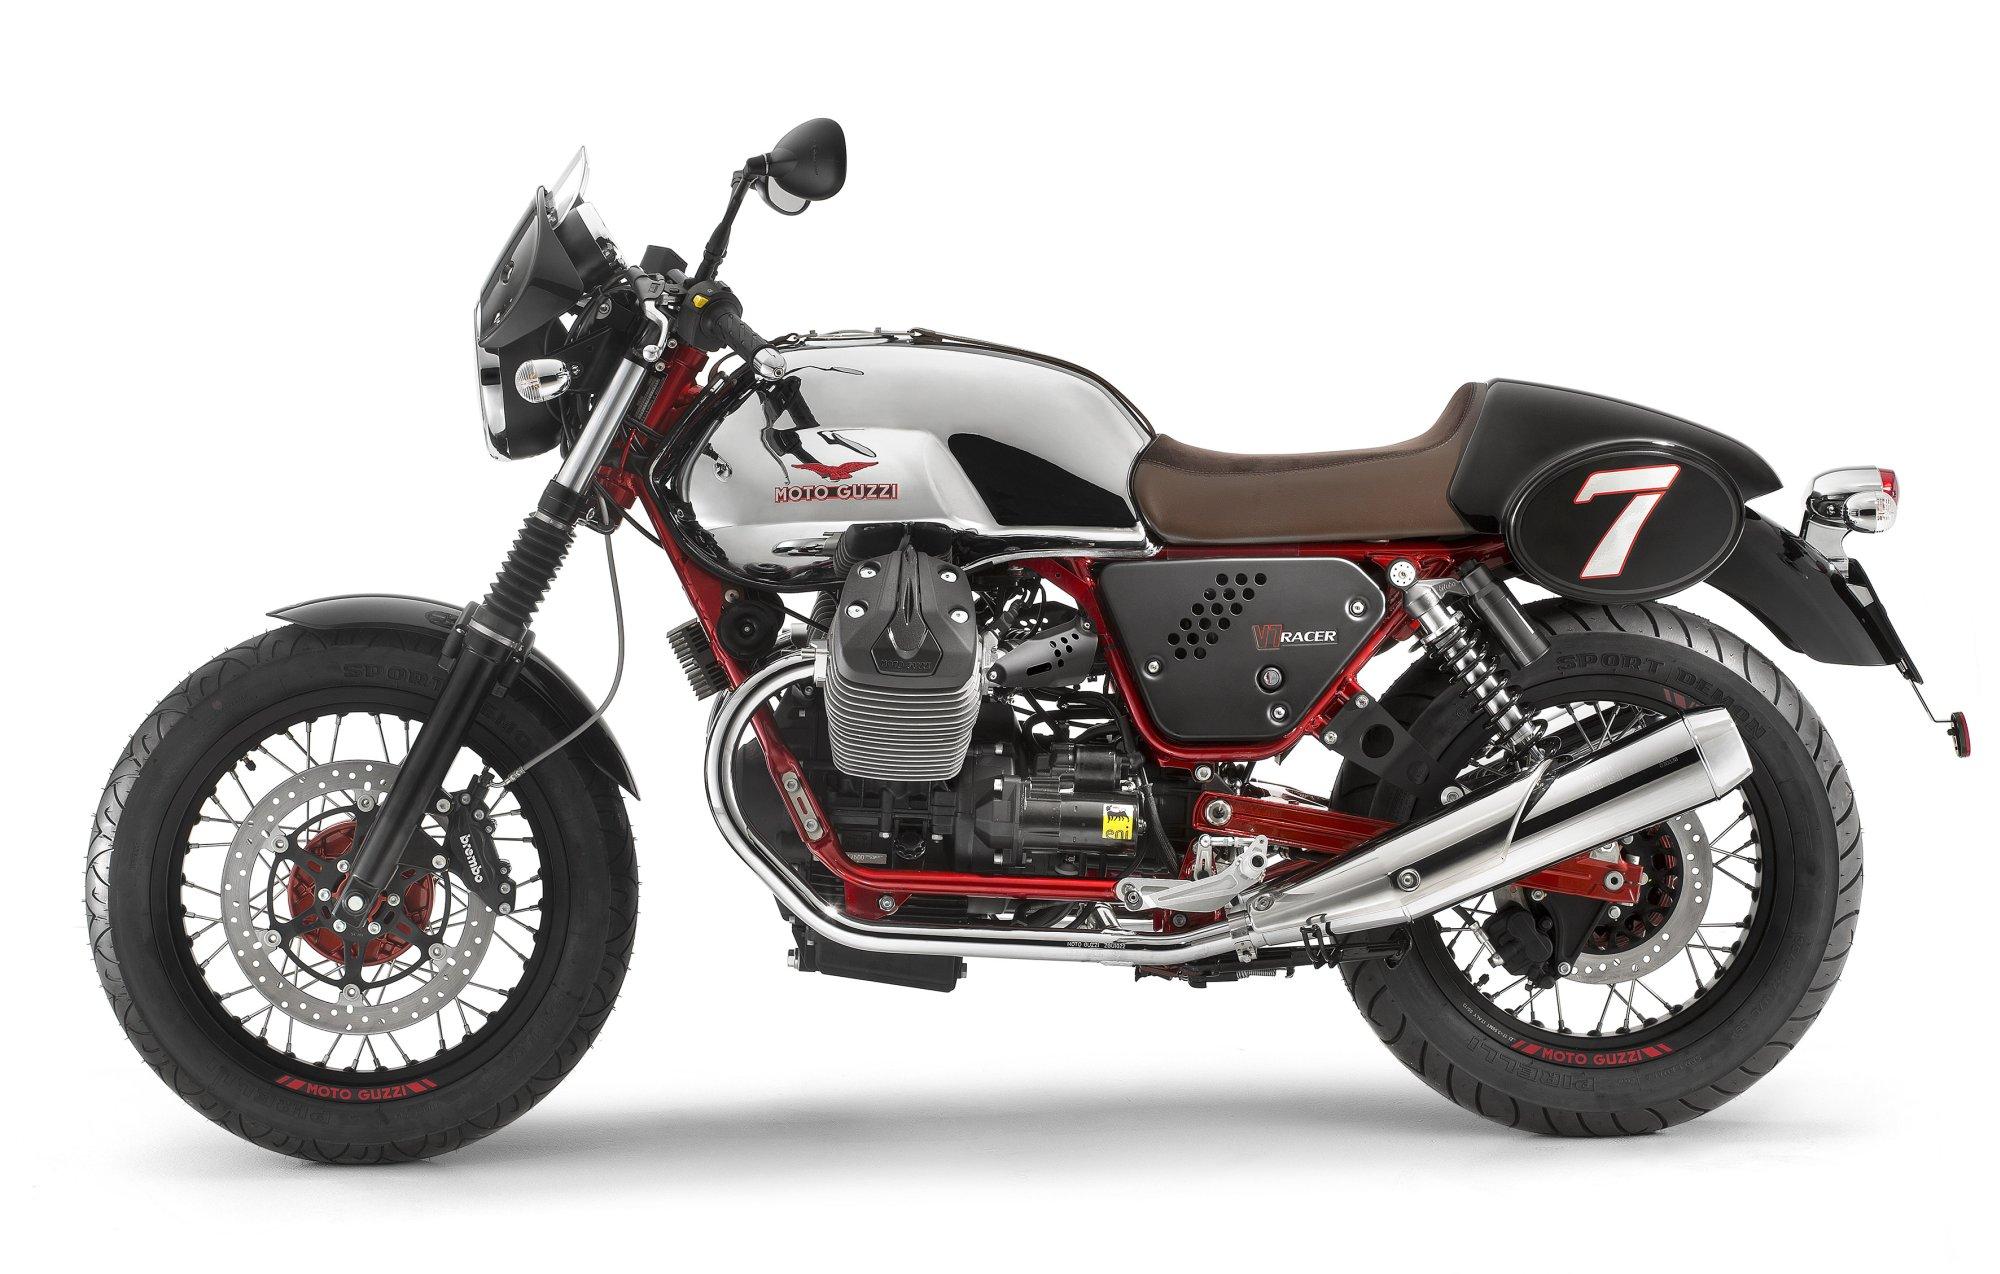 motorrad occasion moto guzzi v7 racer kaufen. Black Bedroom Furniture Sets. Home Design Ideas